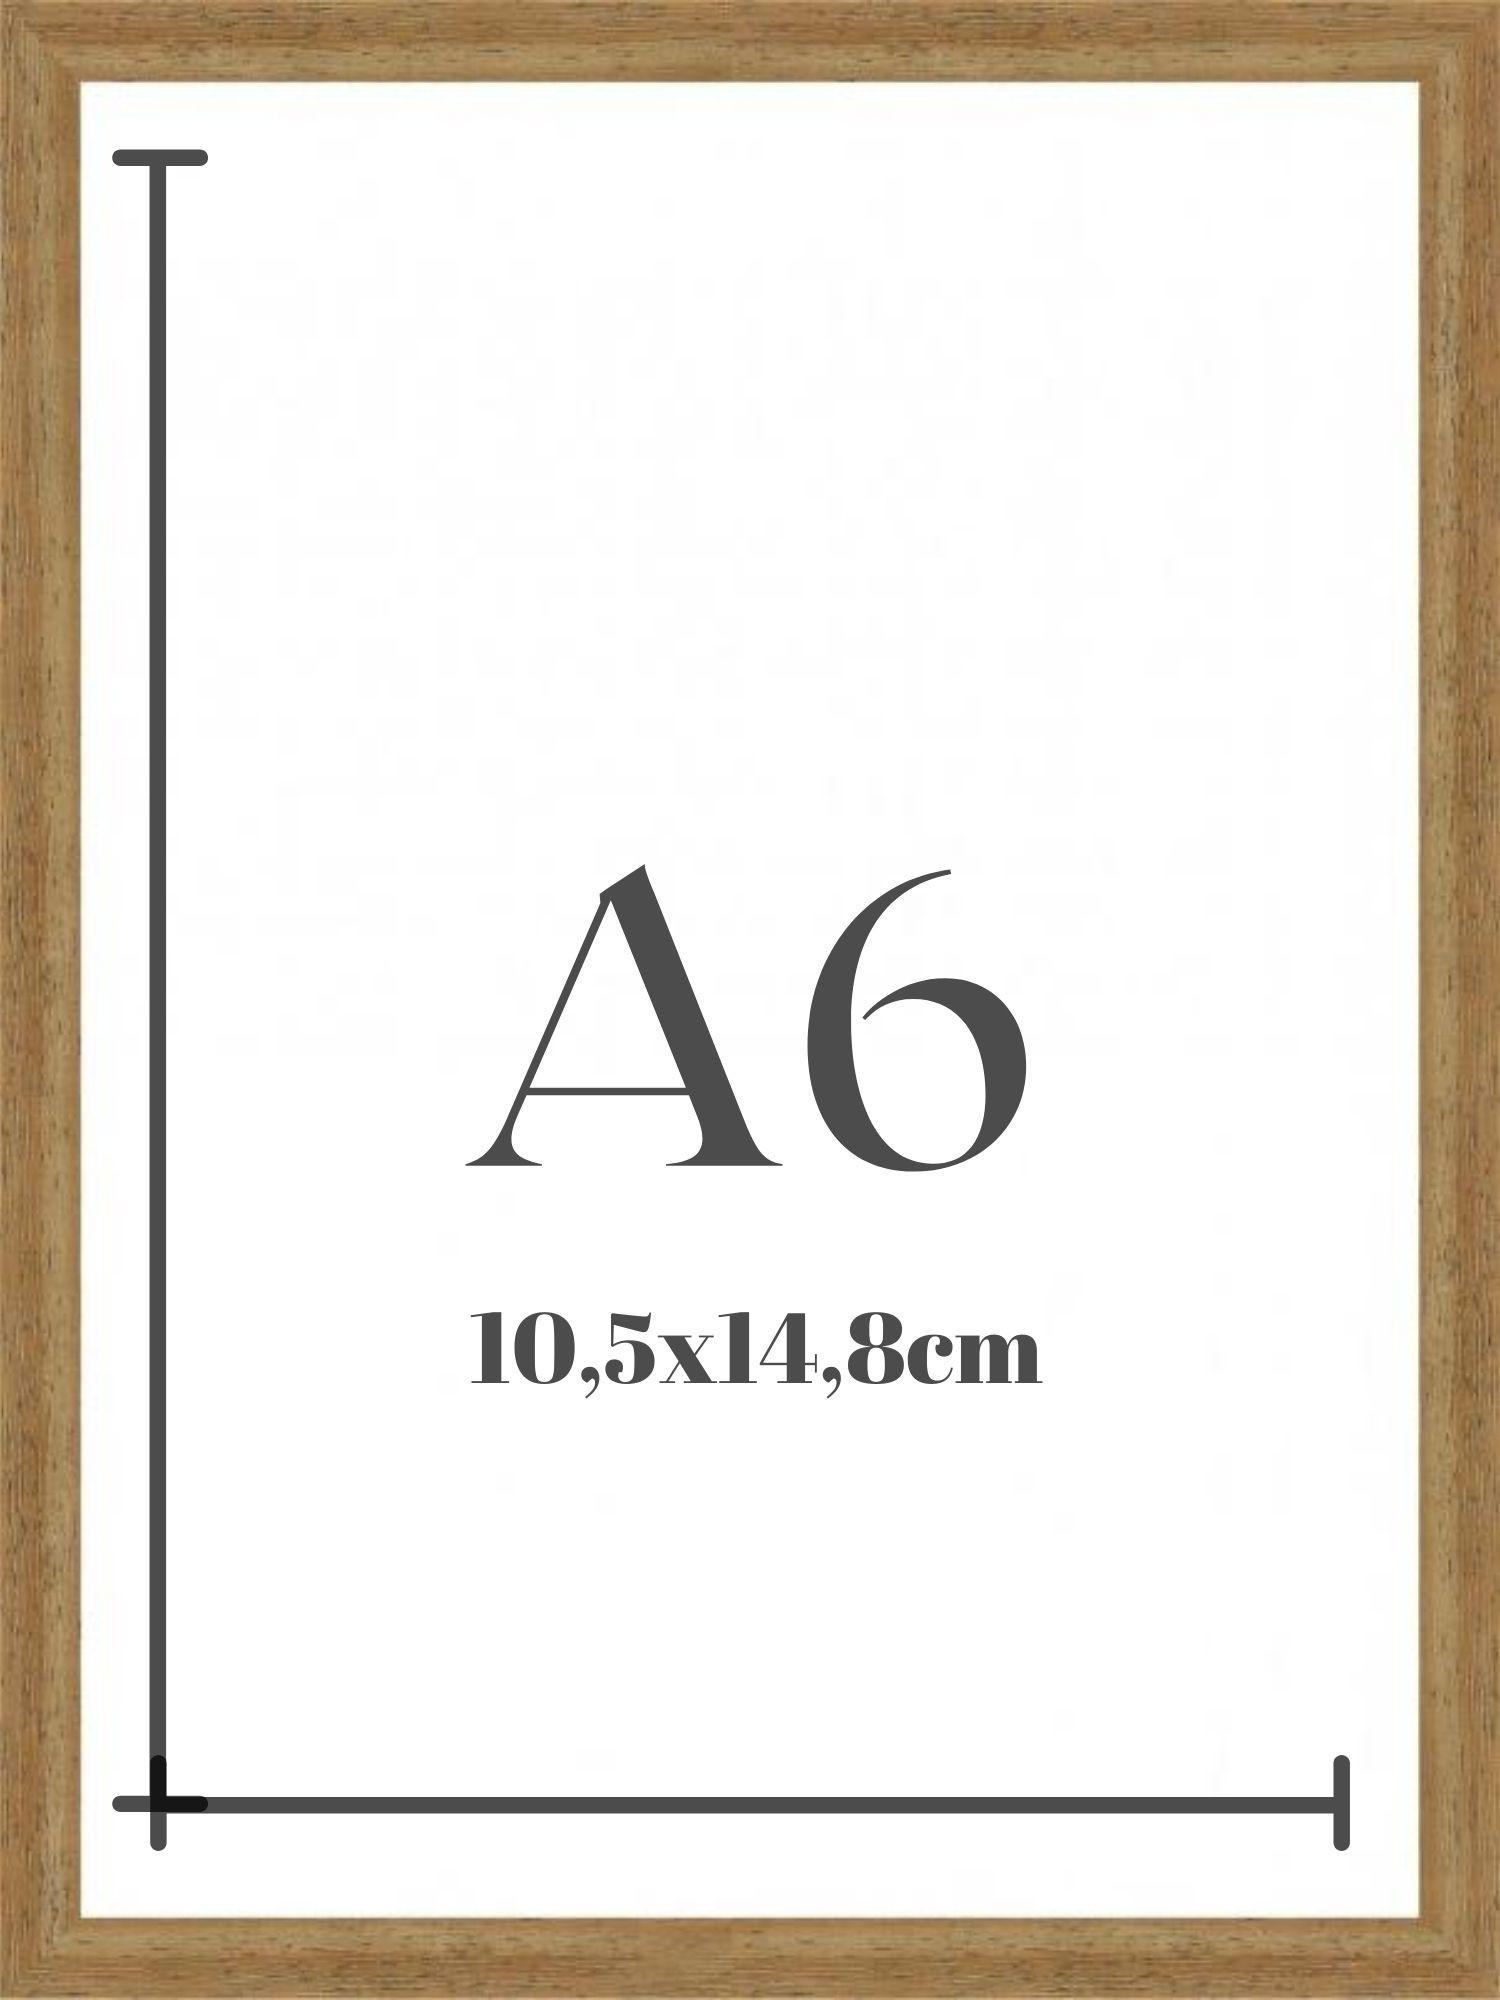 Moldura A6